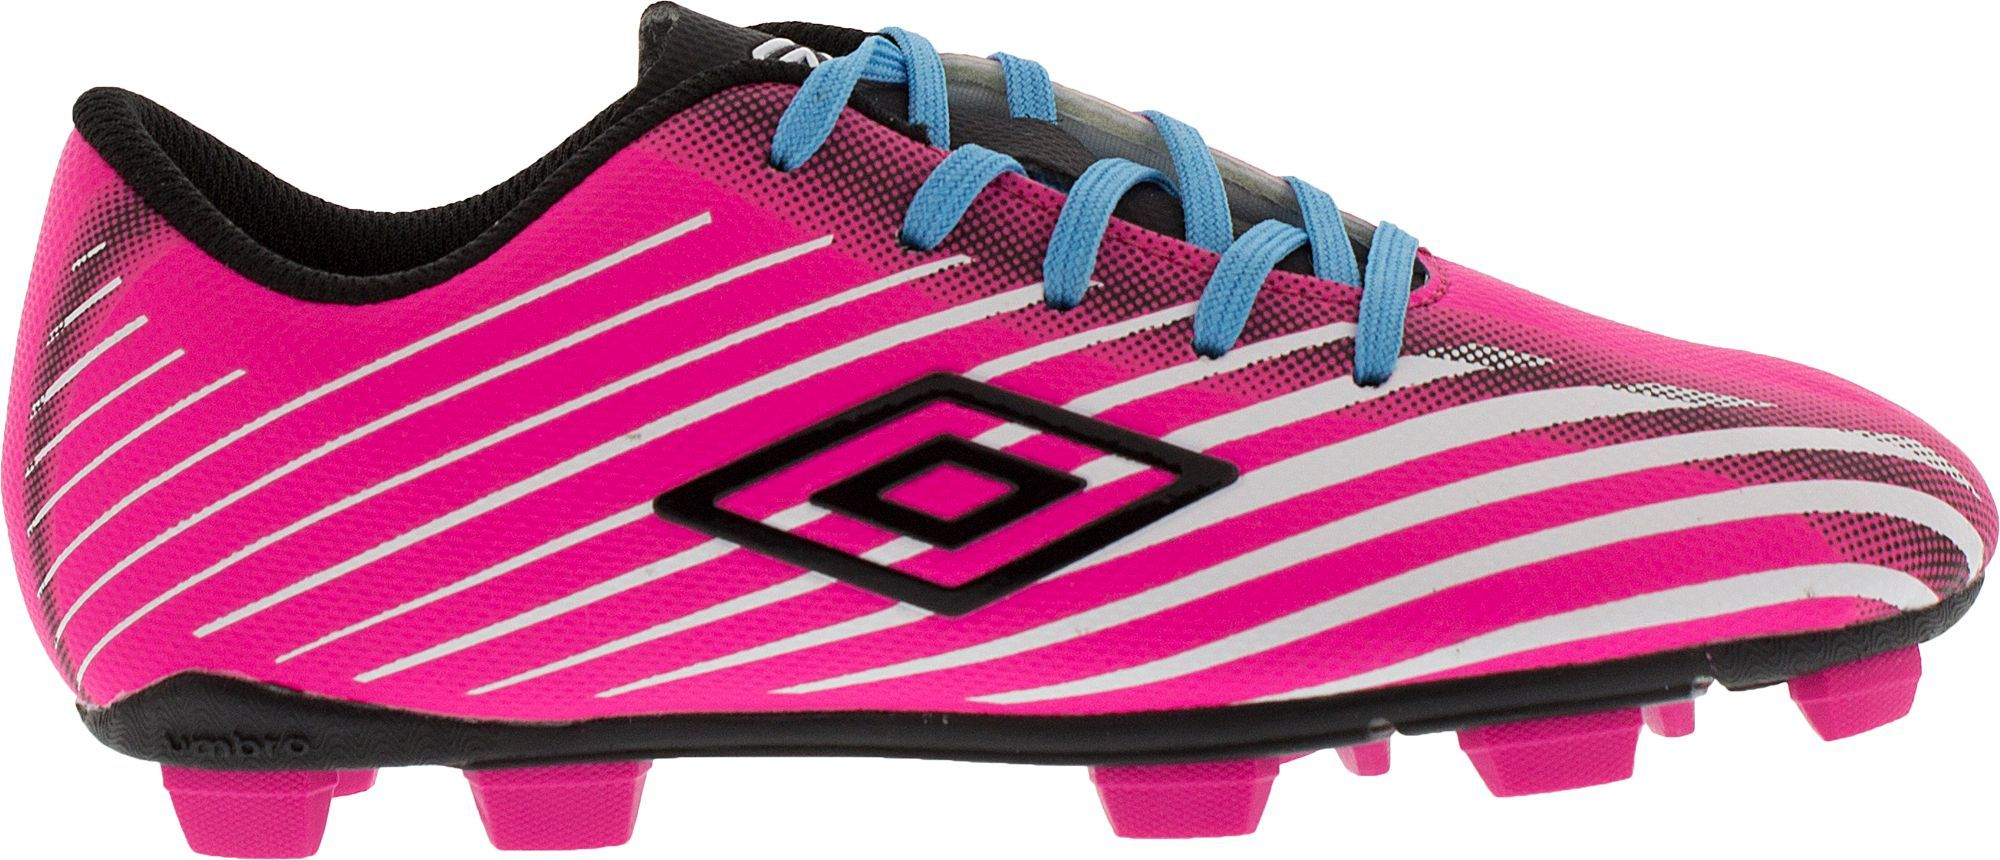 26112b683da2b Umbro Kids' Arturo 2.0 FG Soccer Cleats, Girl's, Size: 2.5, Pink ...